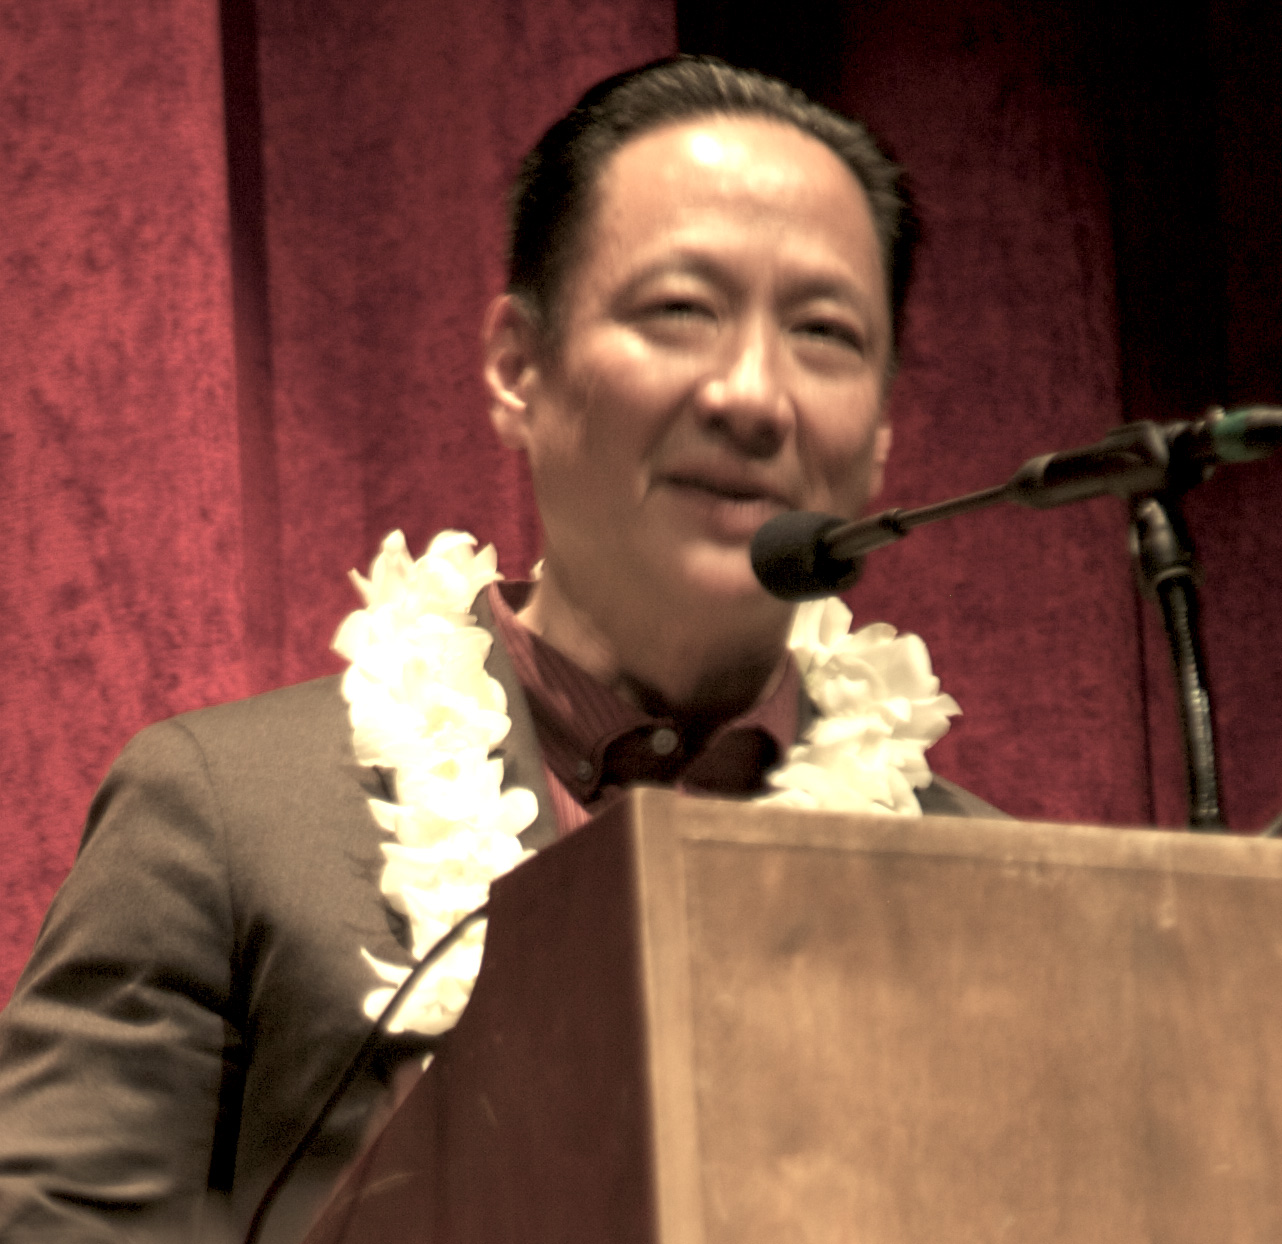 San Francisco Public Defender and documentary filmmaker Jeff Adachi